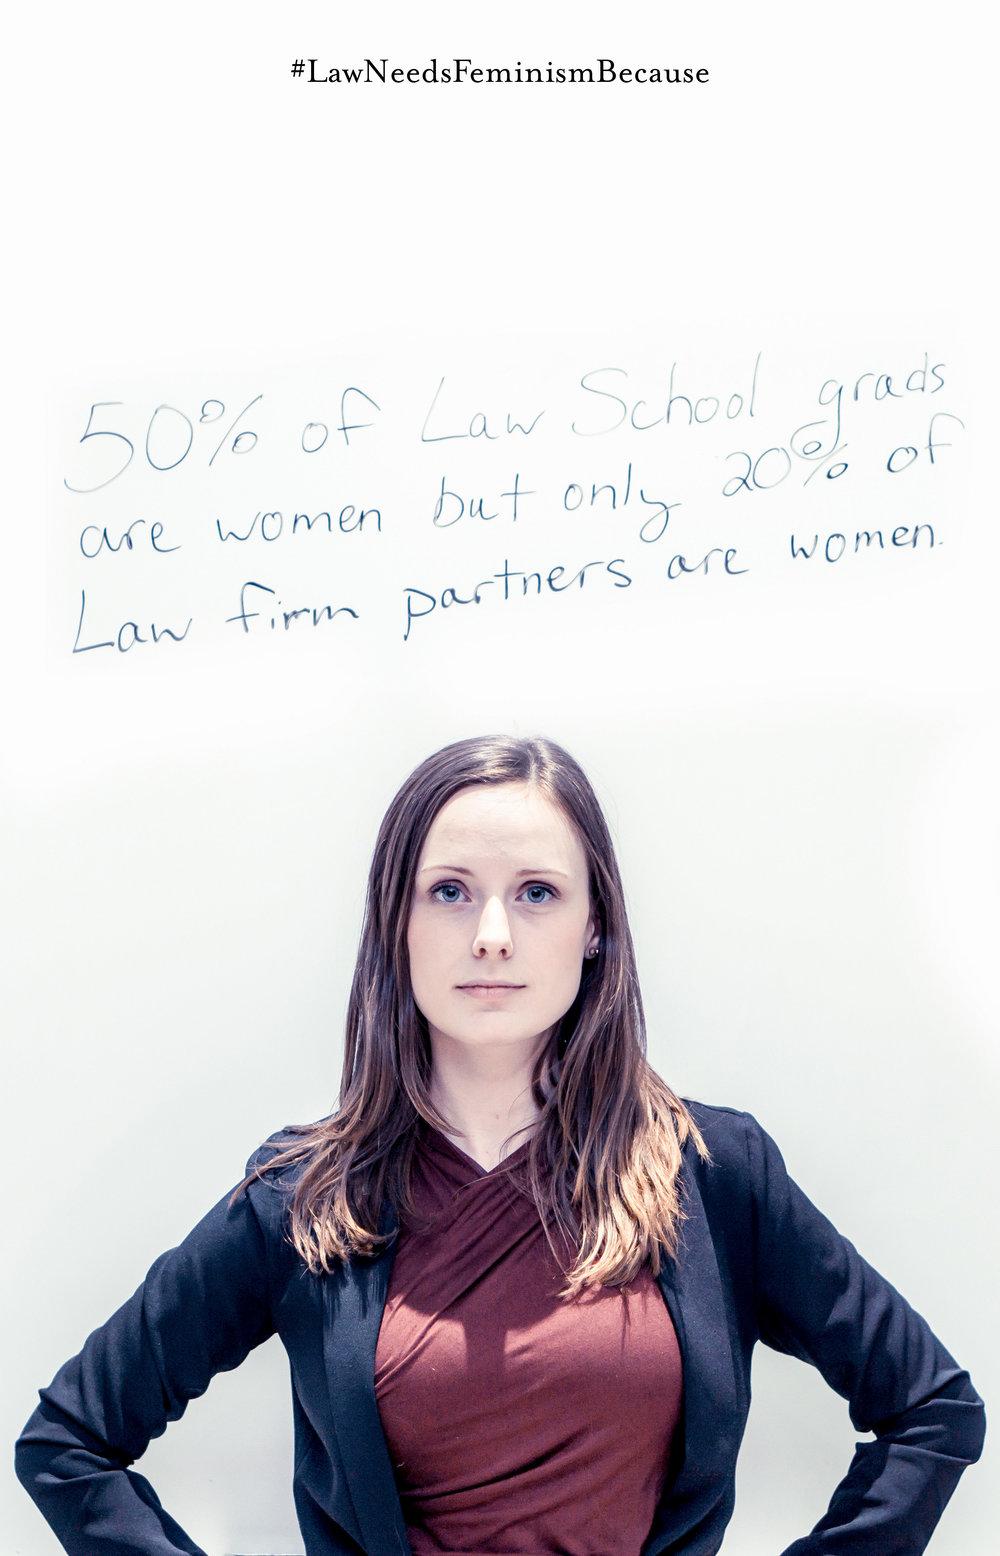 #LawNeedsFeminismBecause-13.jpg